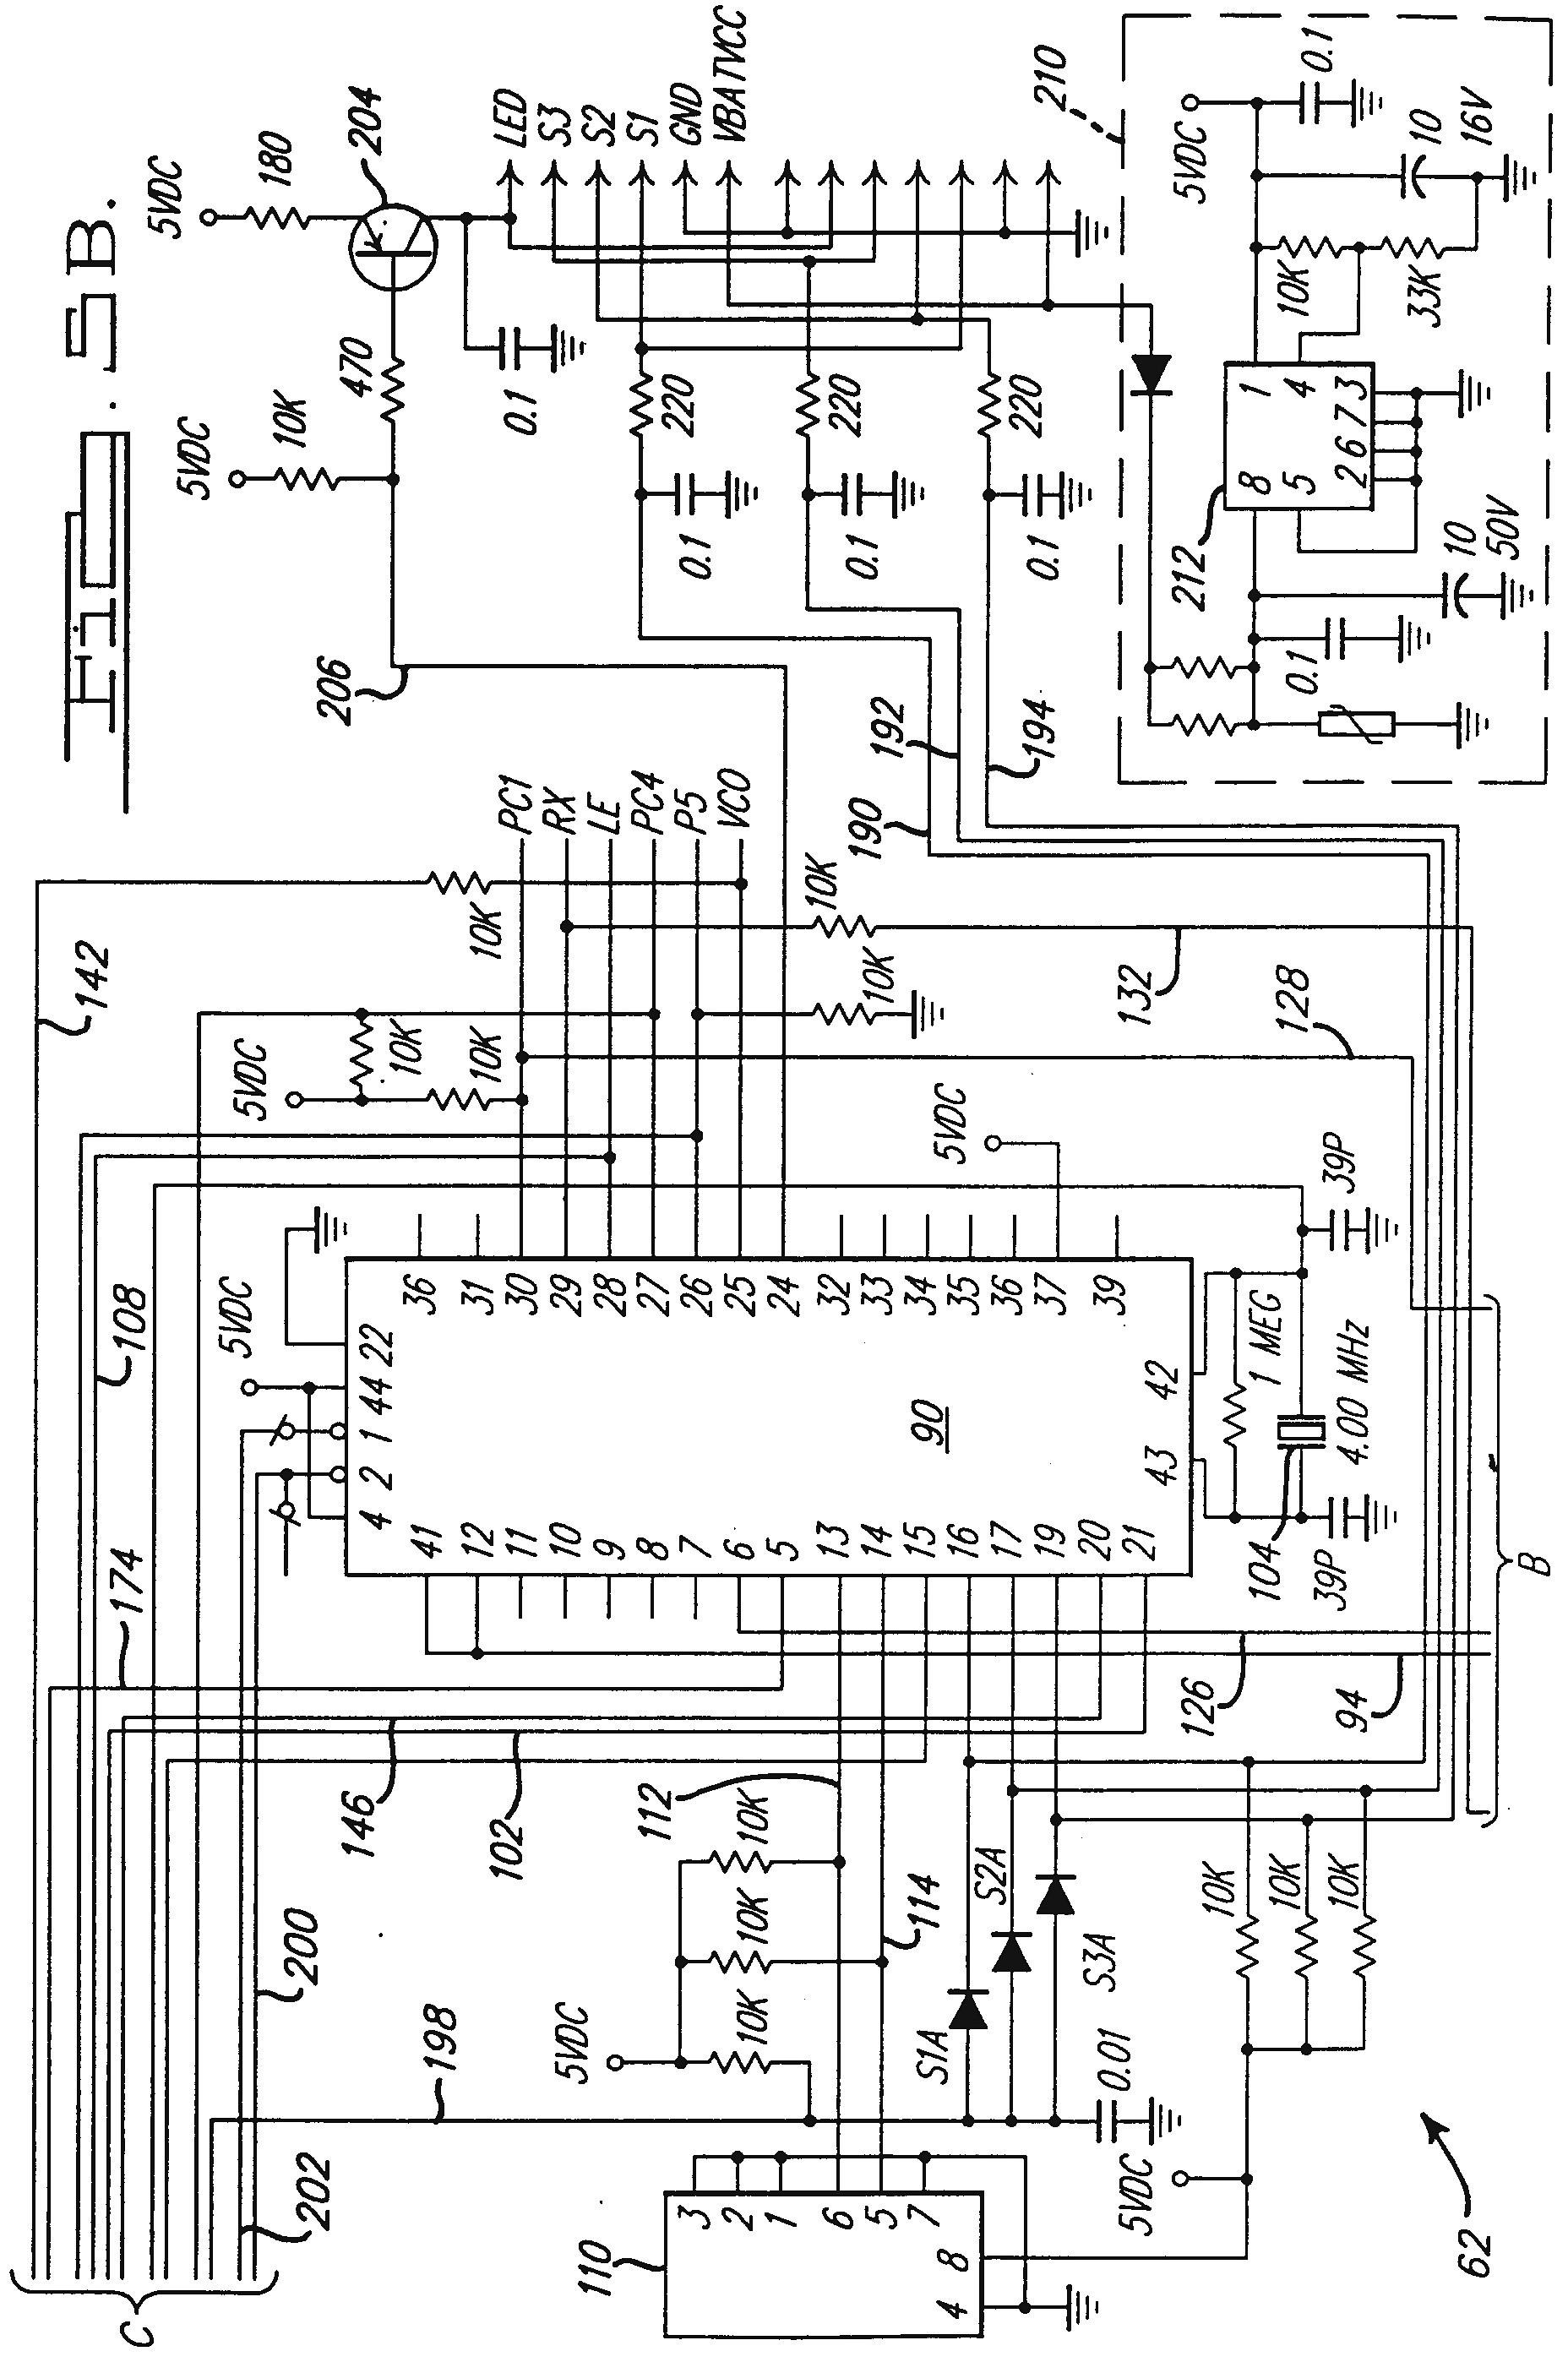 hight resolution of liftmaster wiring diagram sensors free wiring diagramliftmaster wiring diagram sensors genie garage door opener wiring diagram